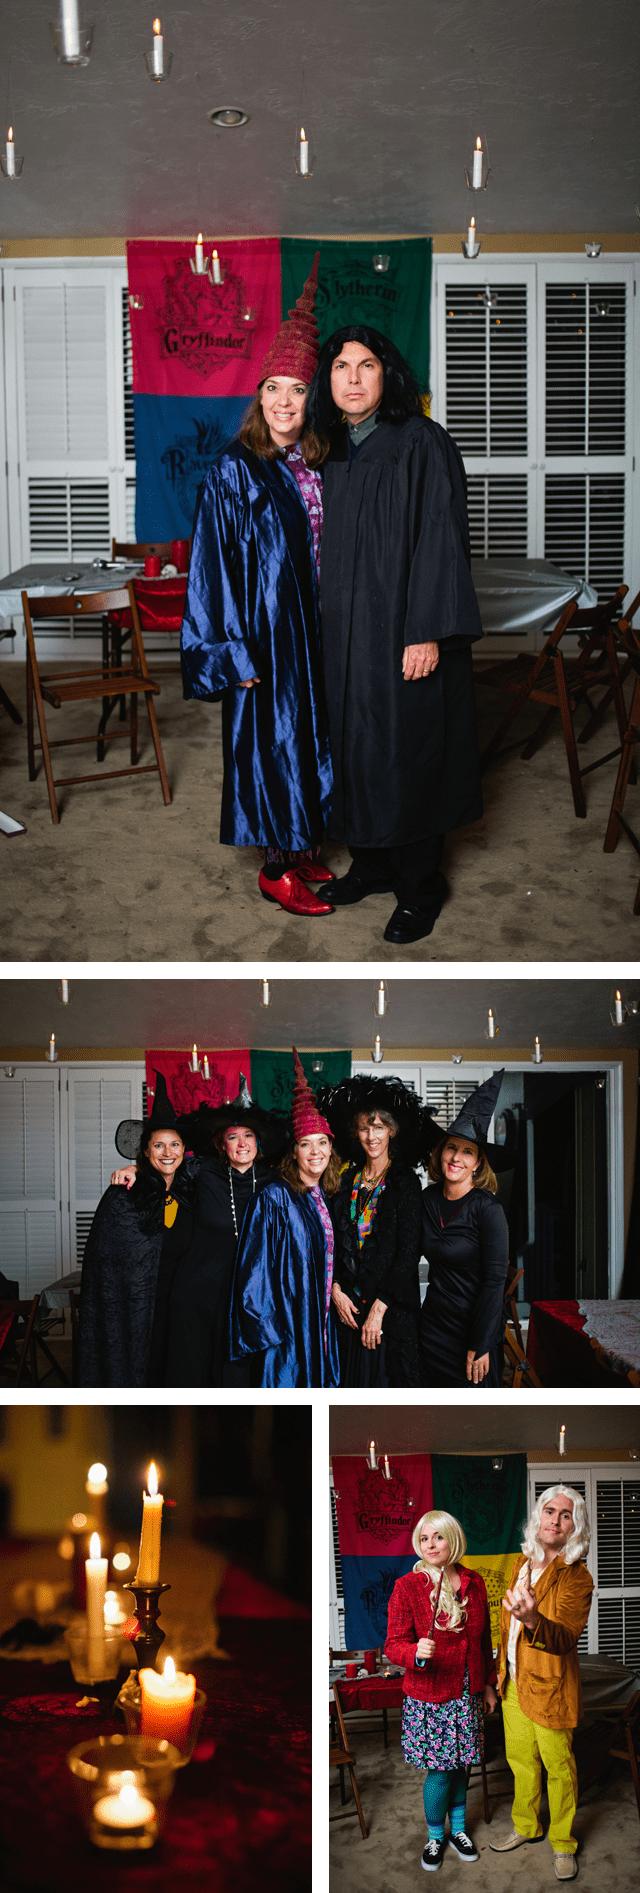 Harry Potter Halloween Party DIY